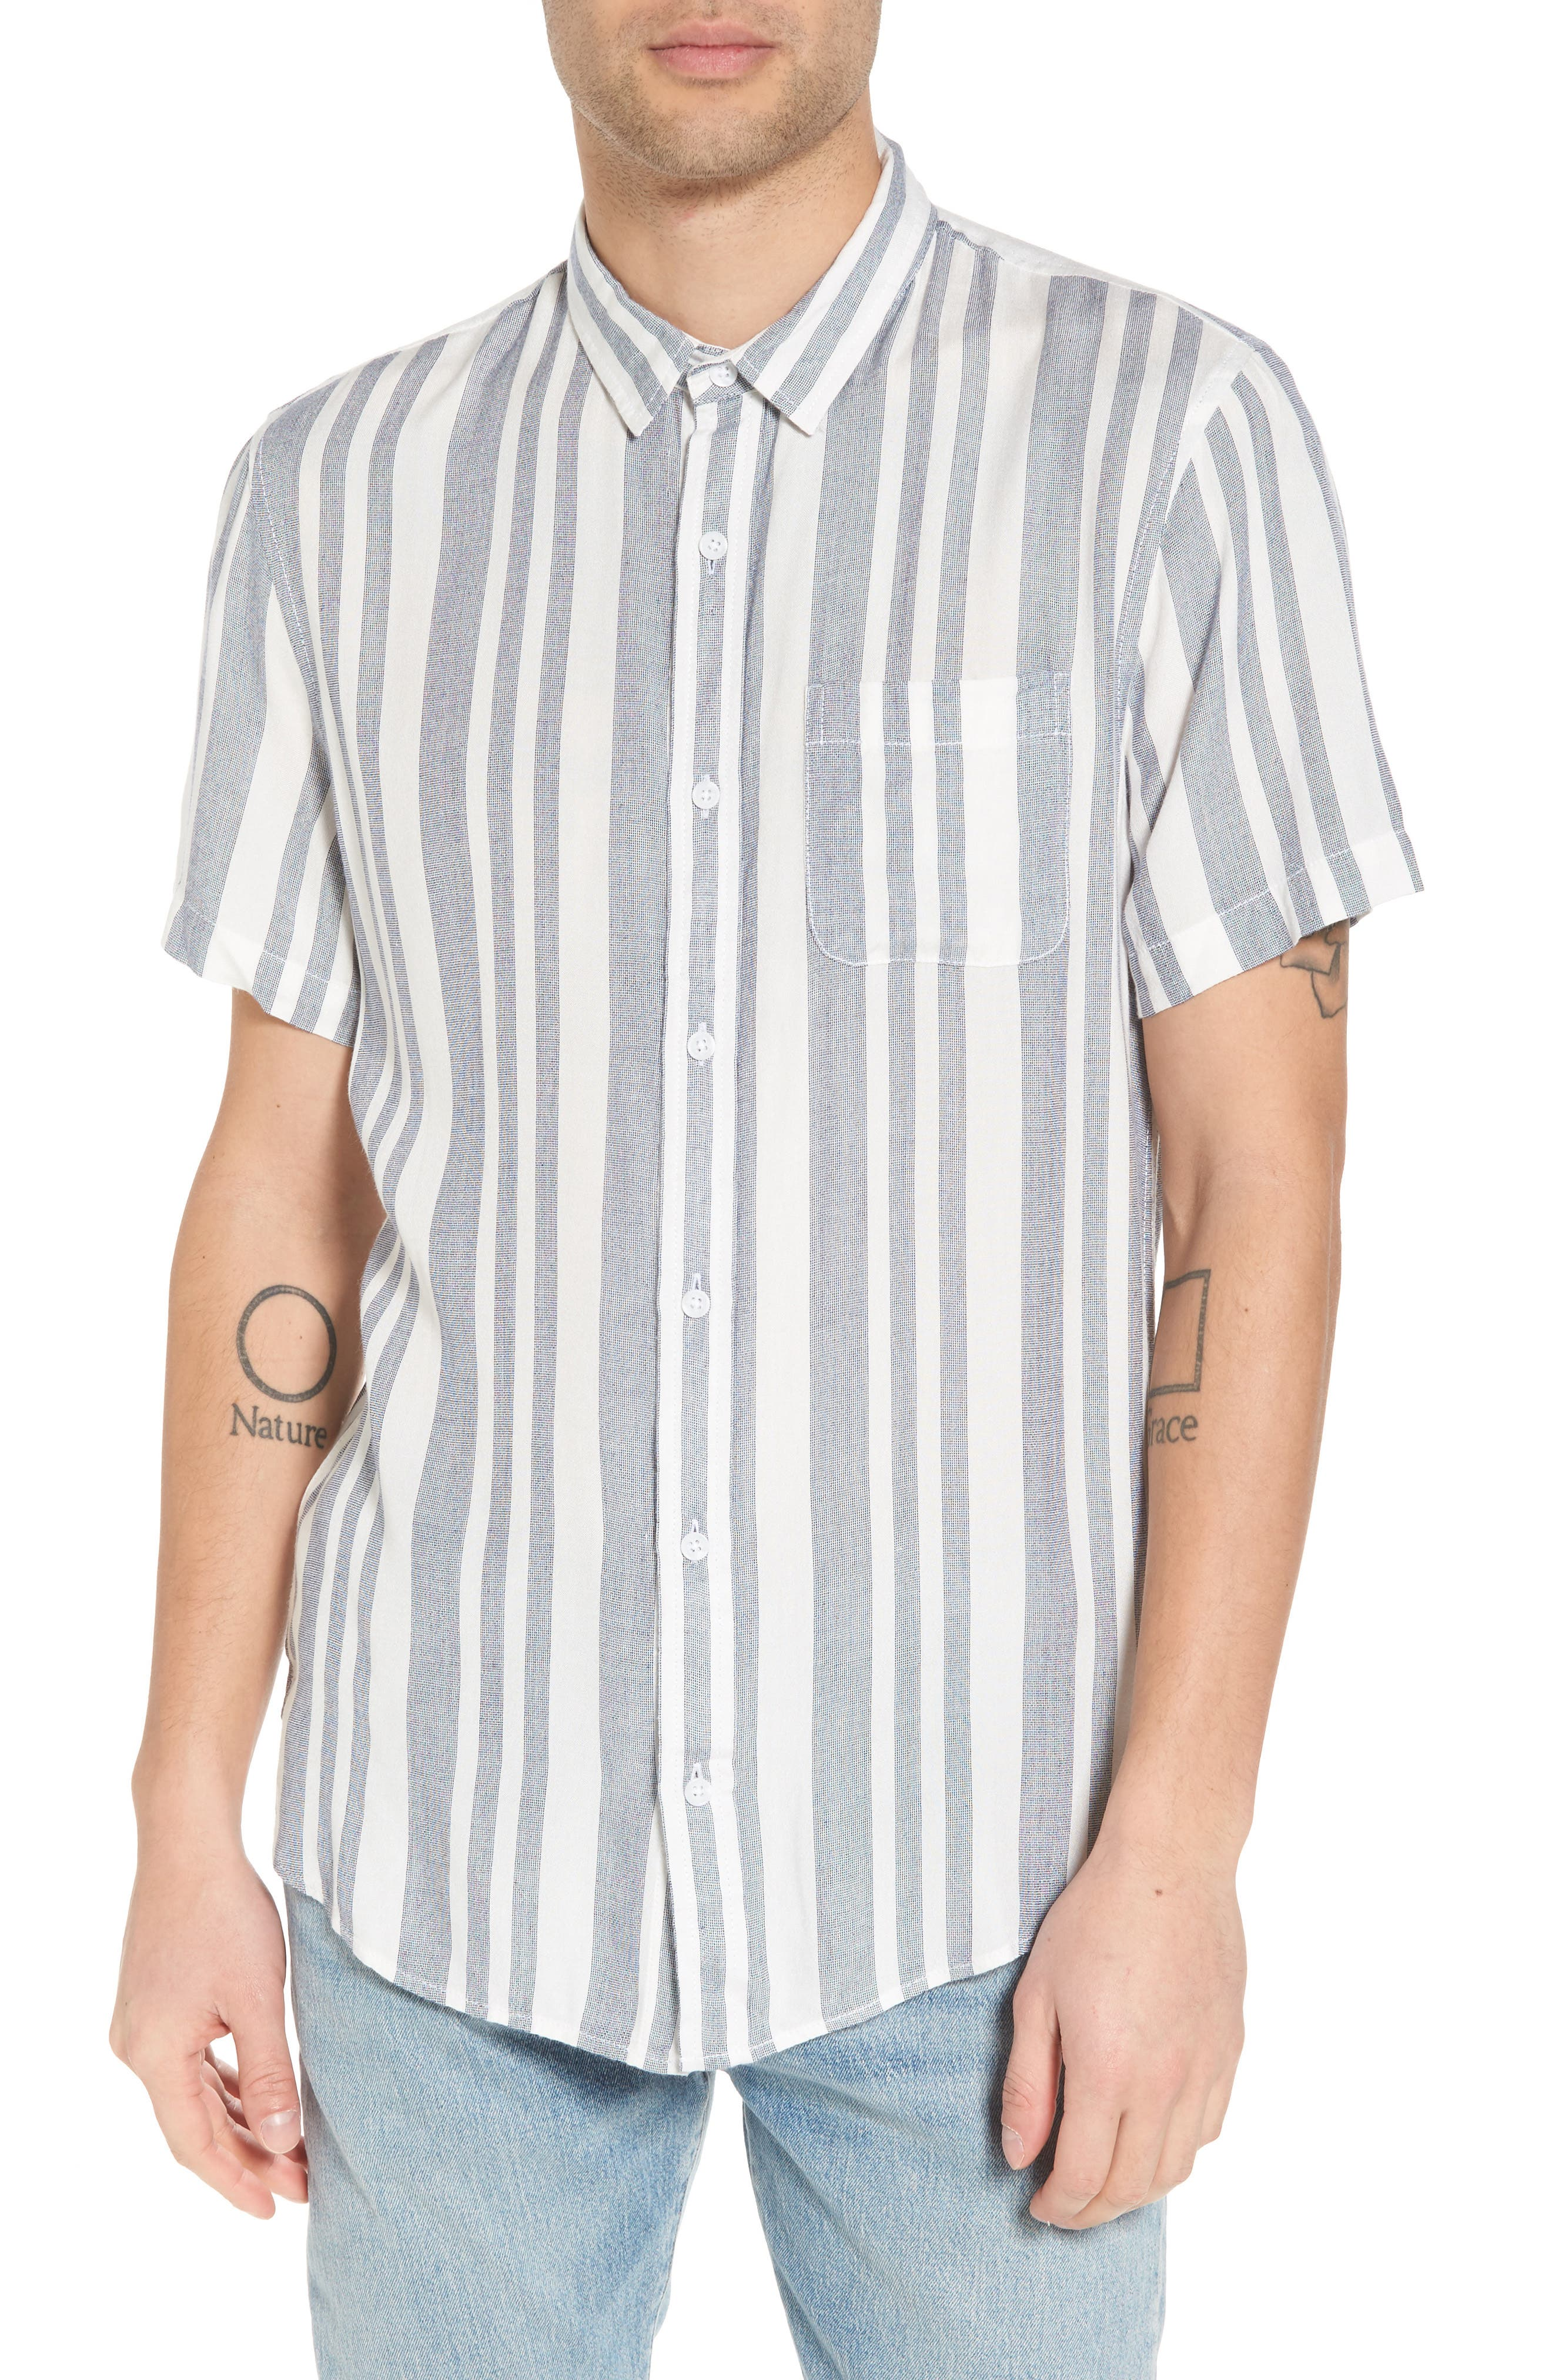 The Rail Stripe Woven Shirt